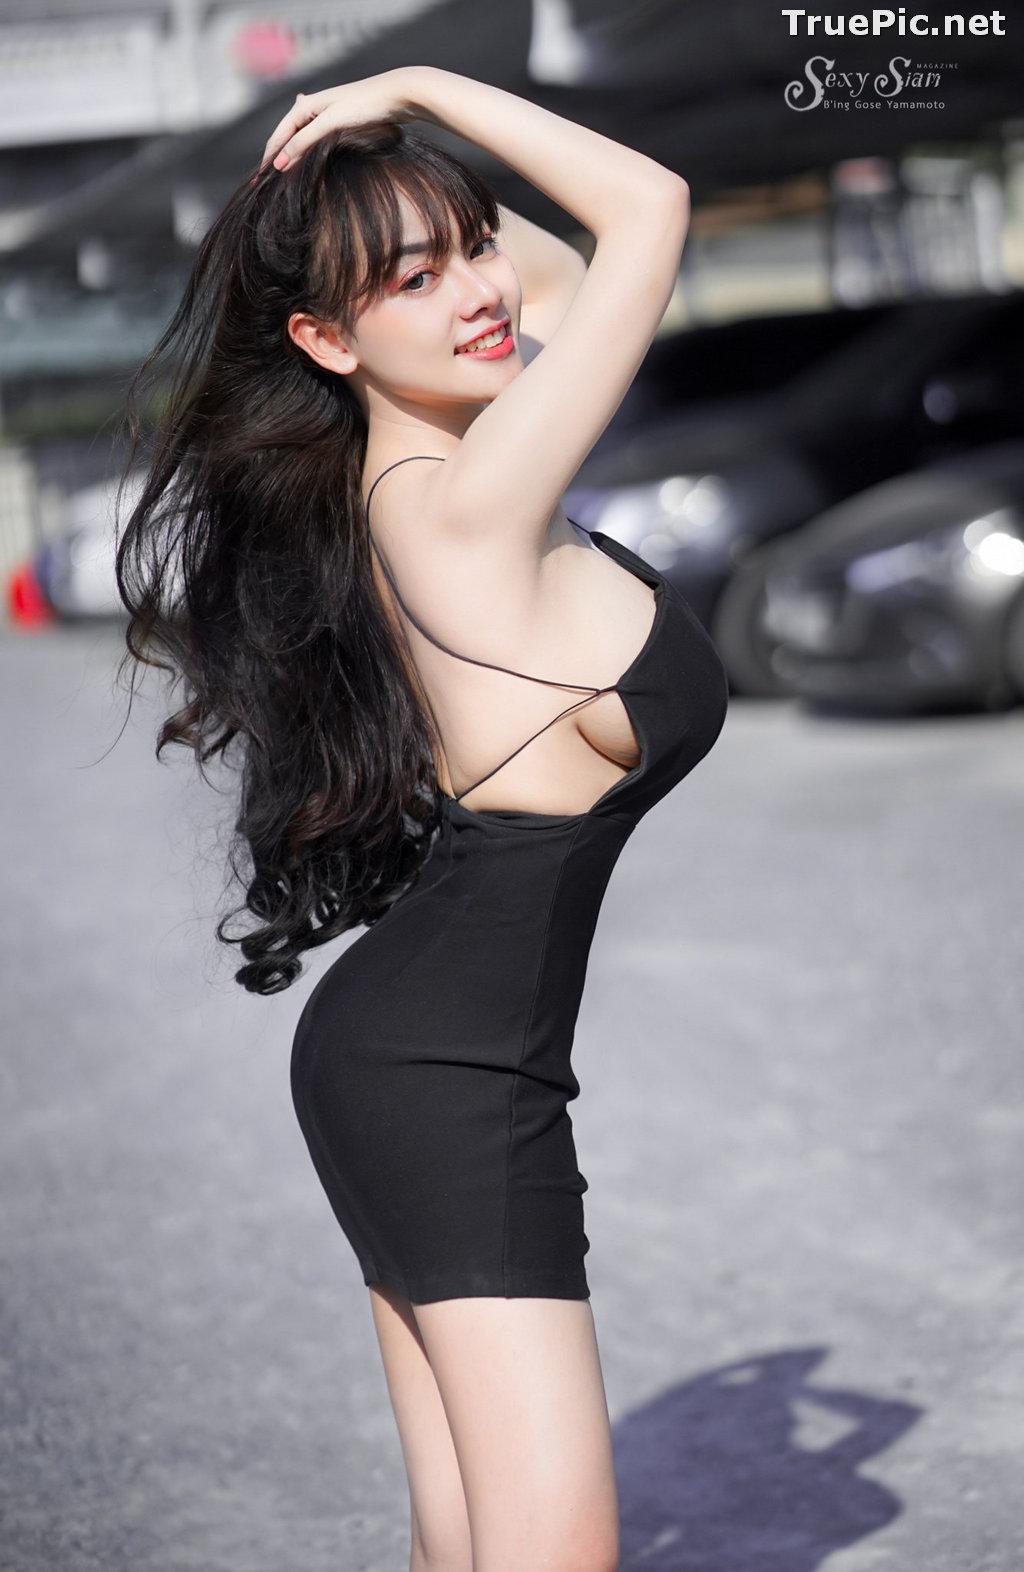 Image Thailand Model - จุ๊ปเปอร์ จุ๊ป - Sexy Black Car Girl - TruePic.net - Picture-6